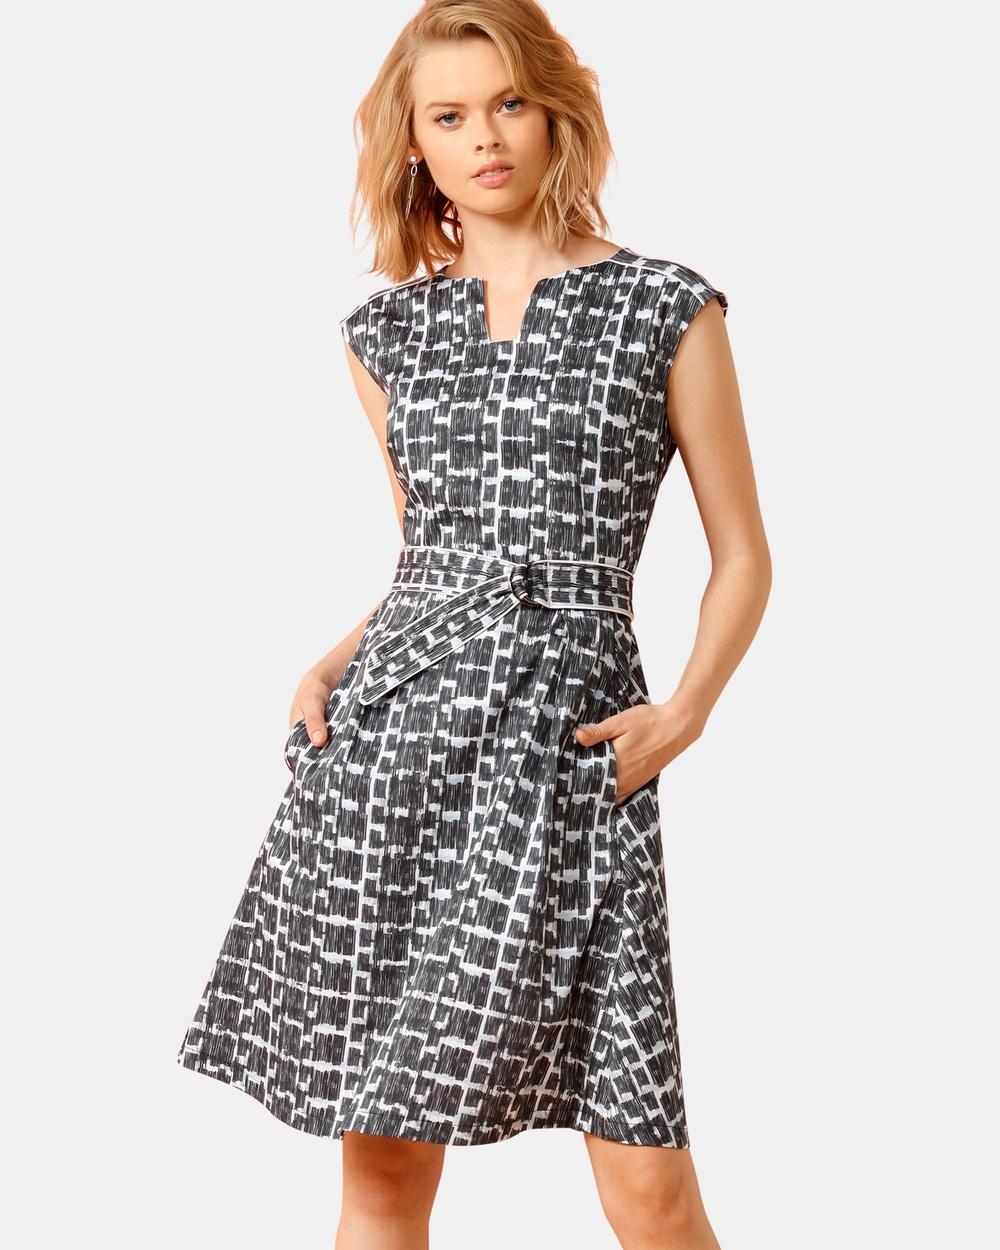 SACHA DRAKE Blue Olmstead Dress